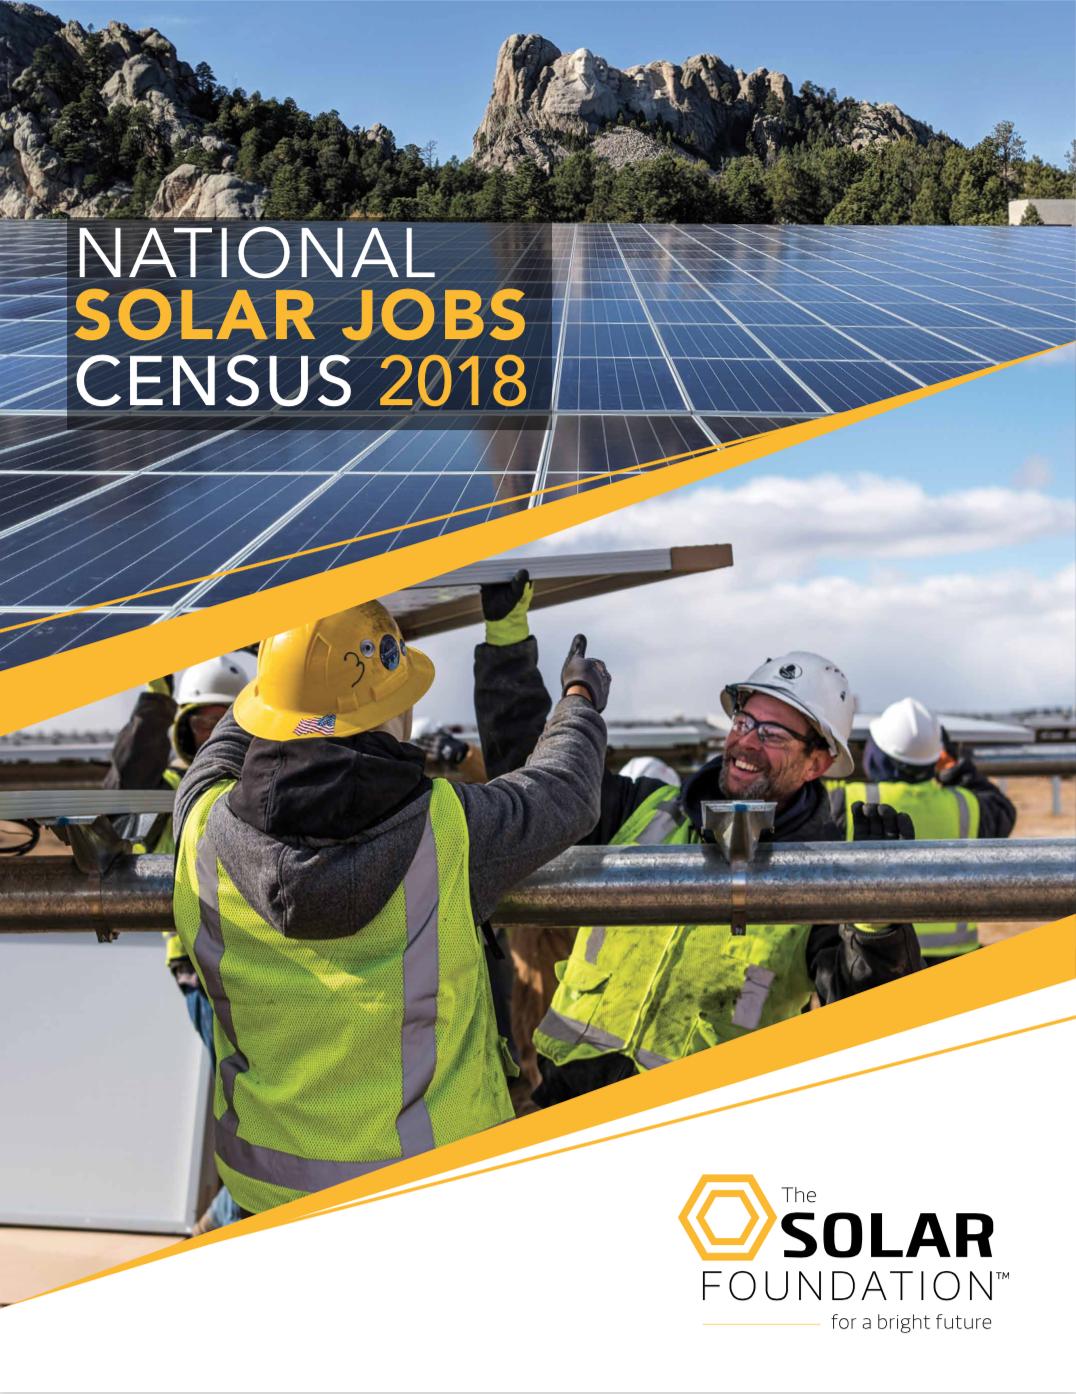 National Solar Jobs Census 2018